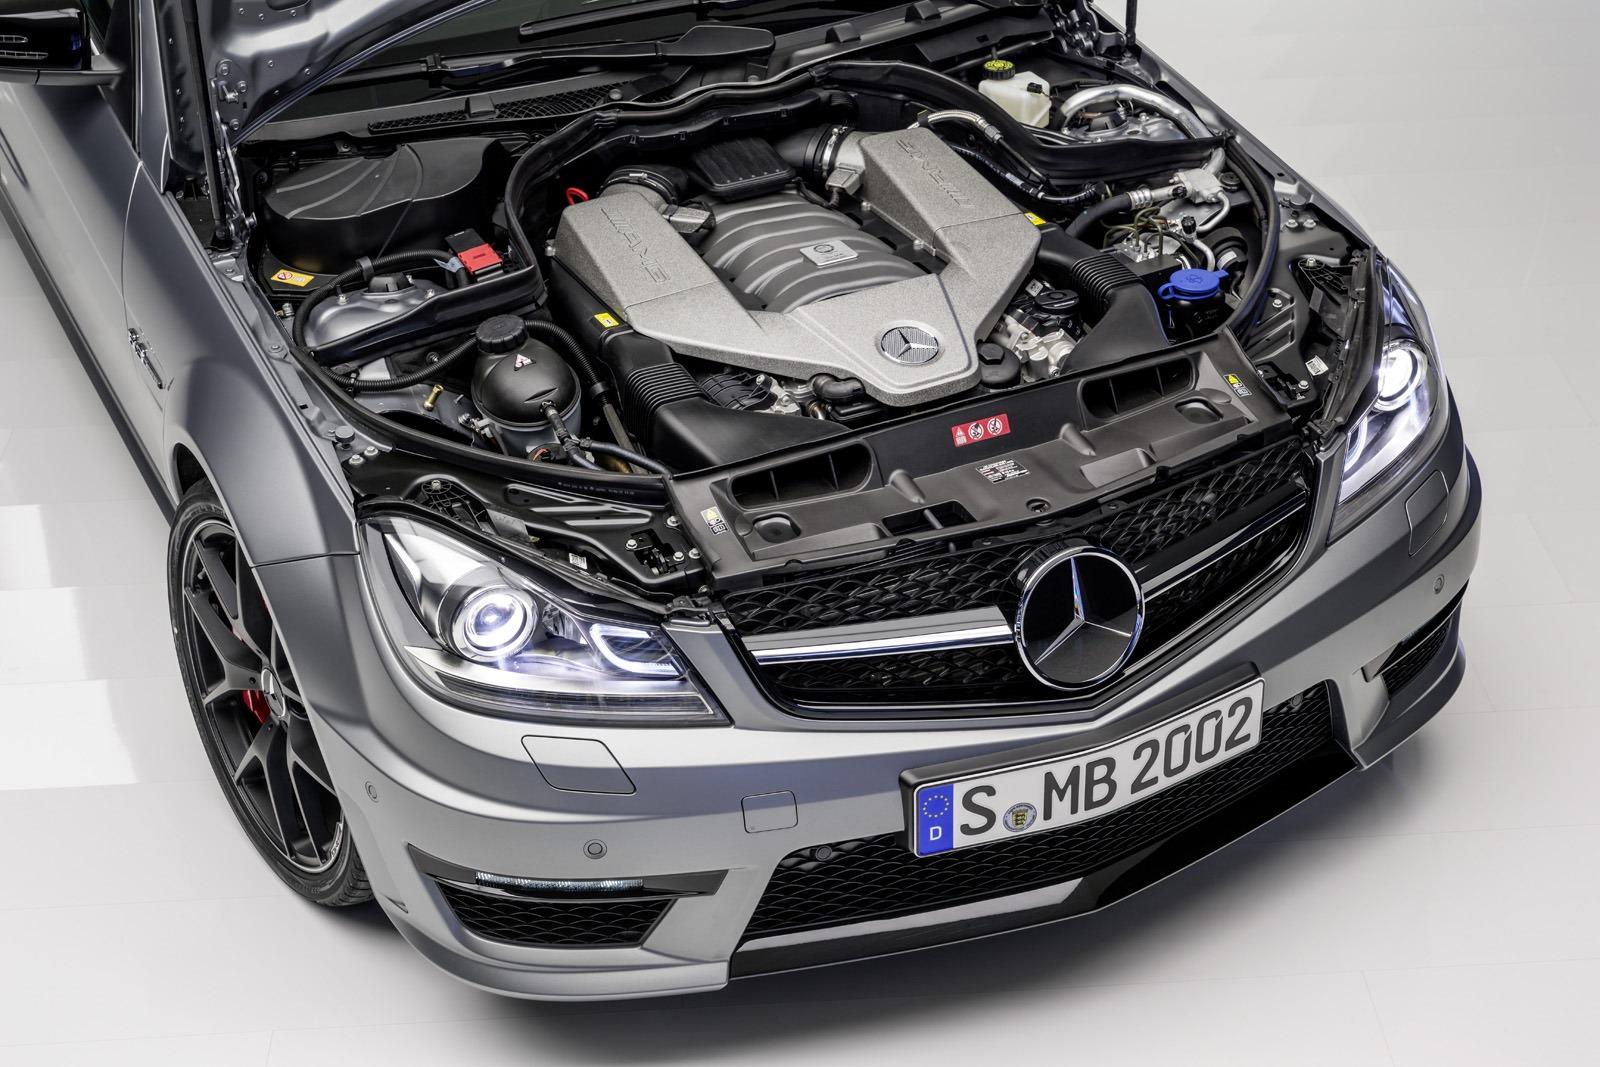 Mercedes-C63-AMG-Edition-507-6%25255B3%25255D.jpg